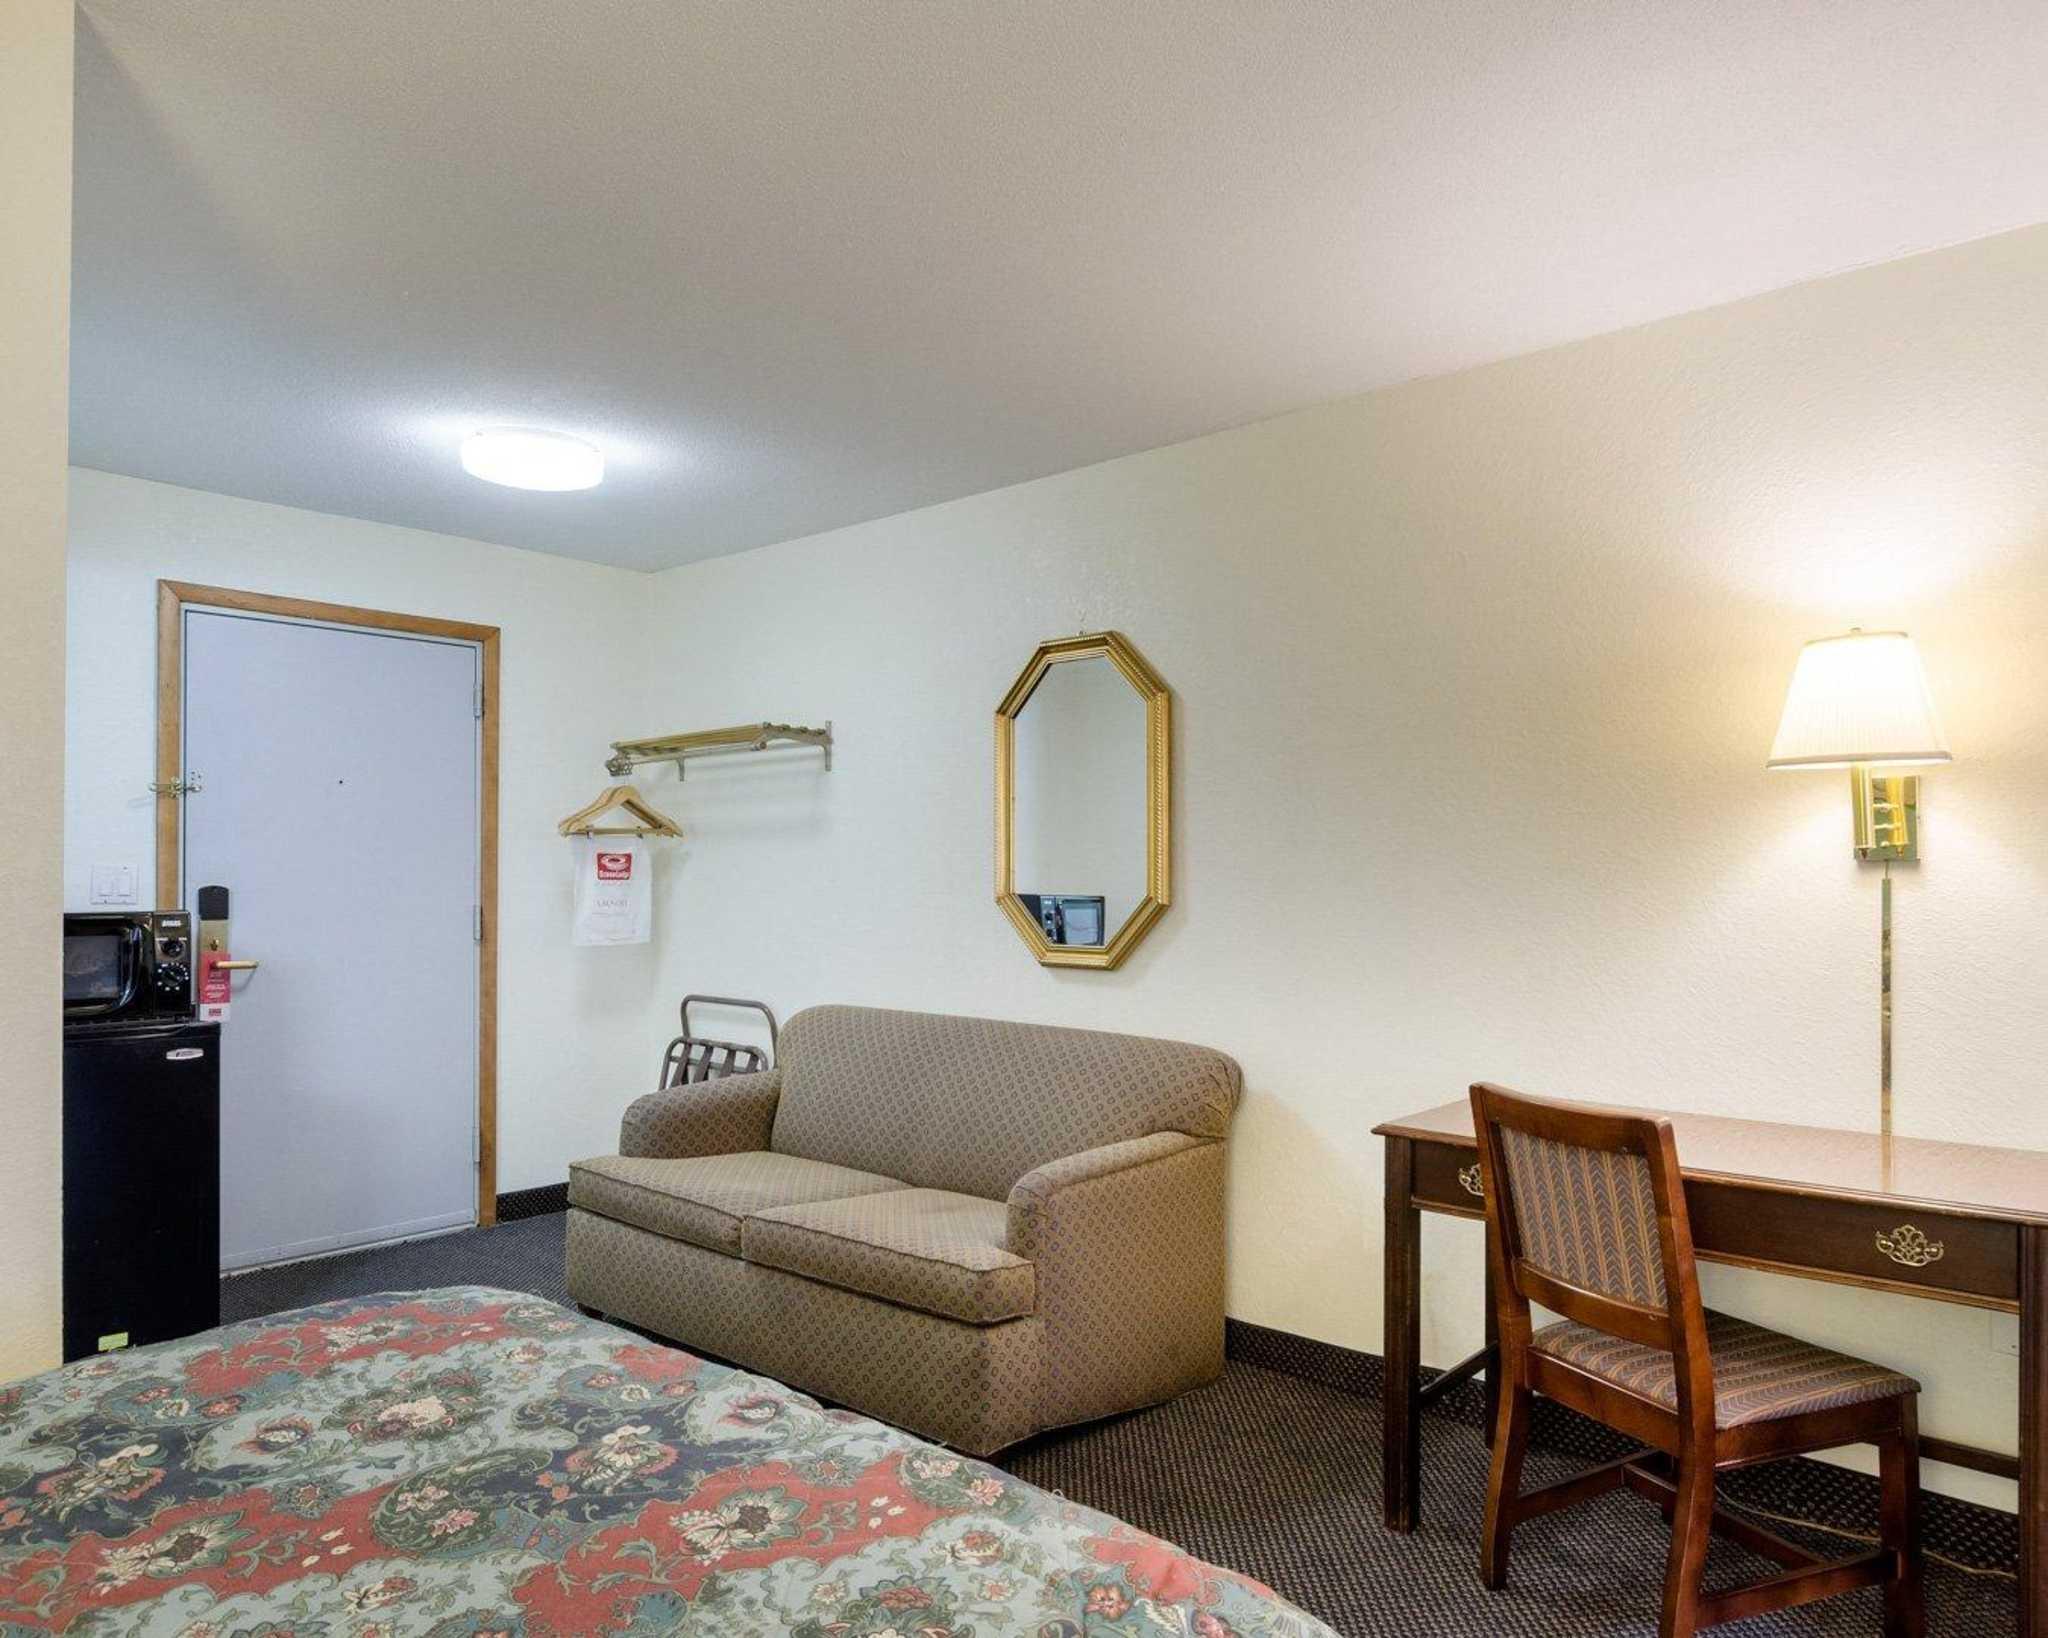 Econo Lodge image 16